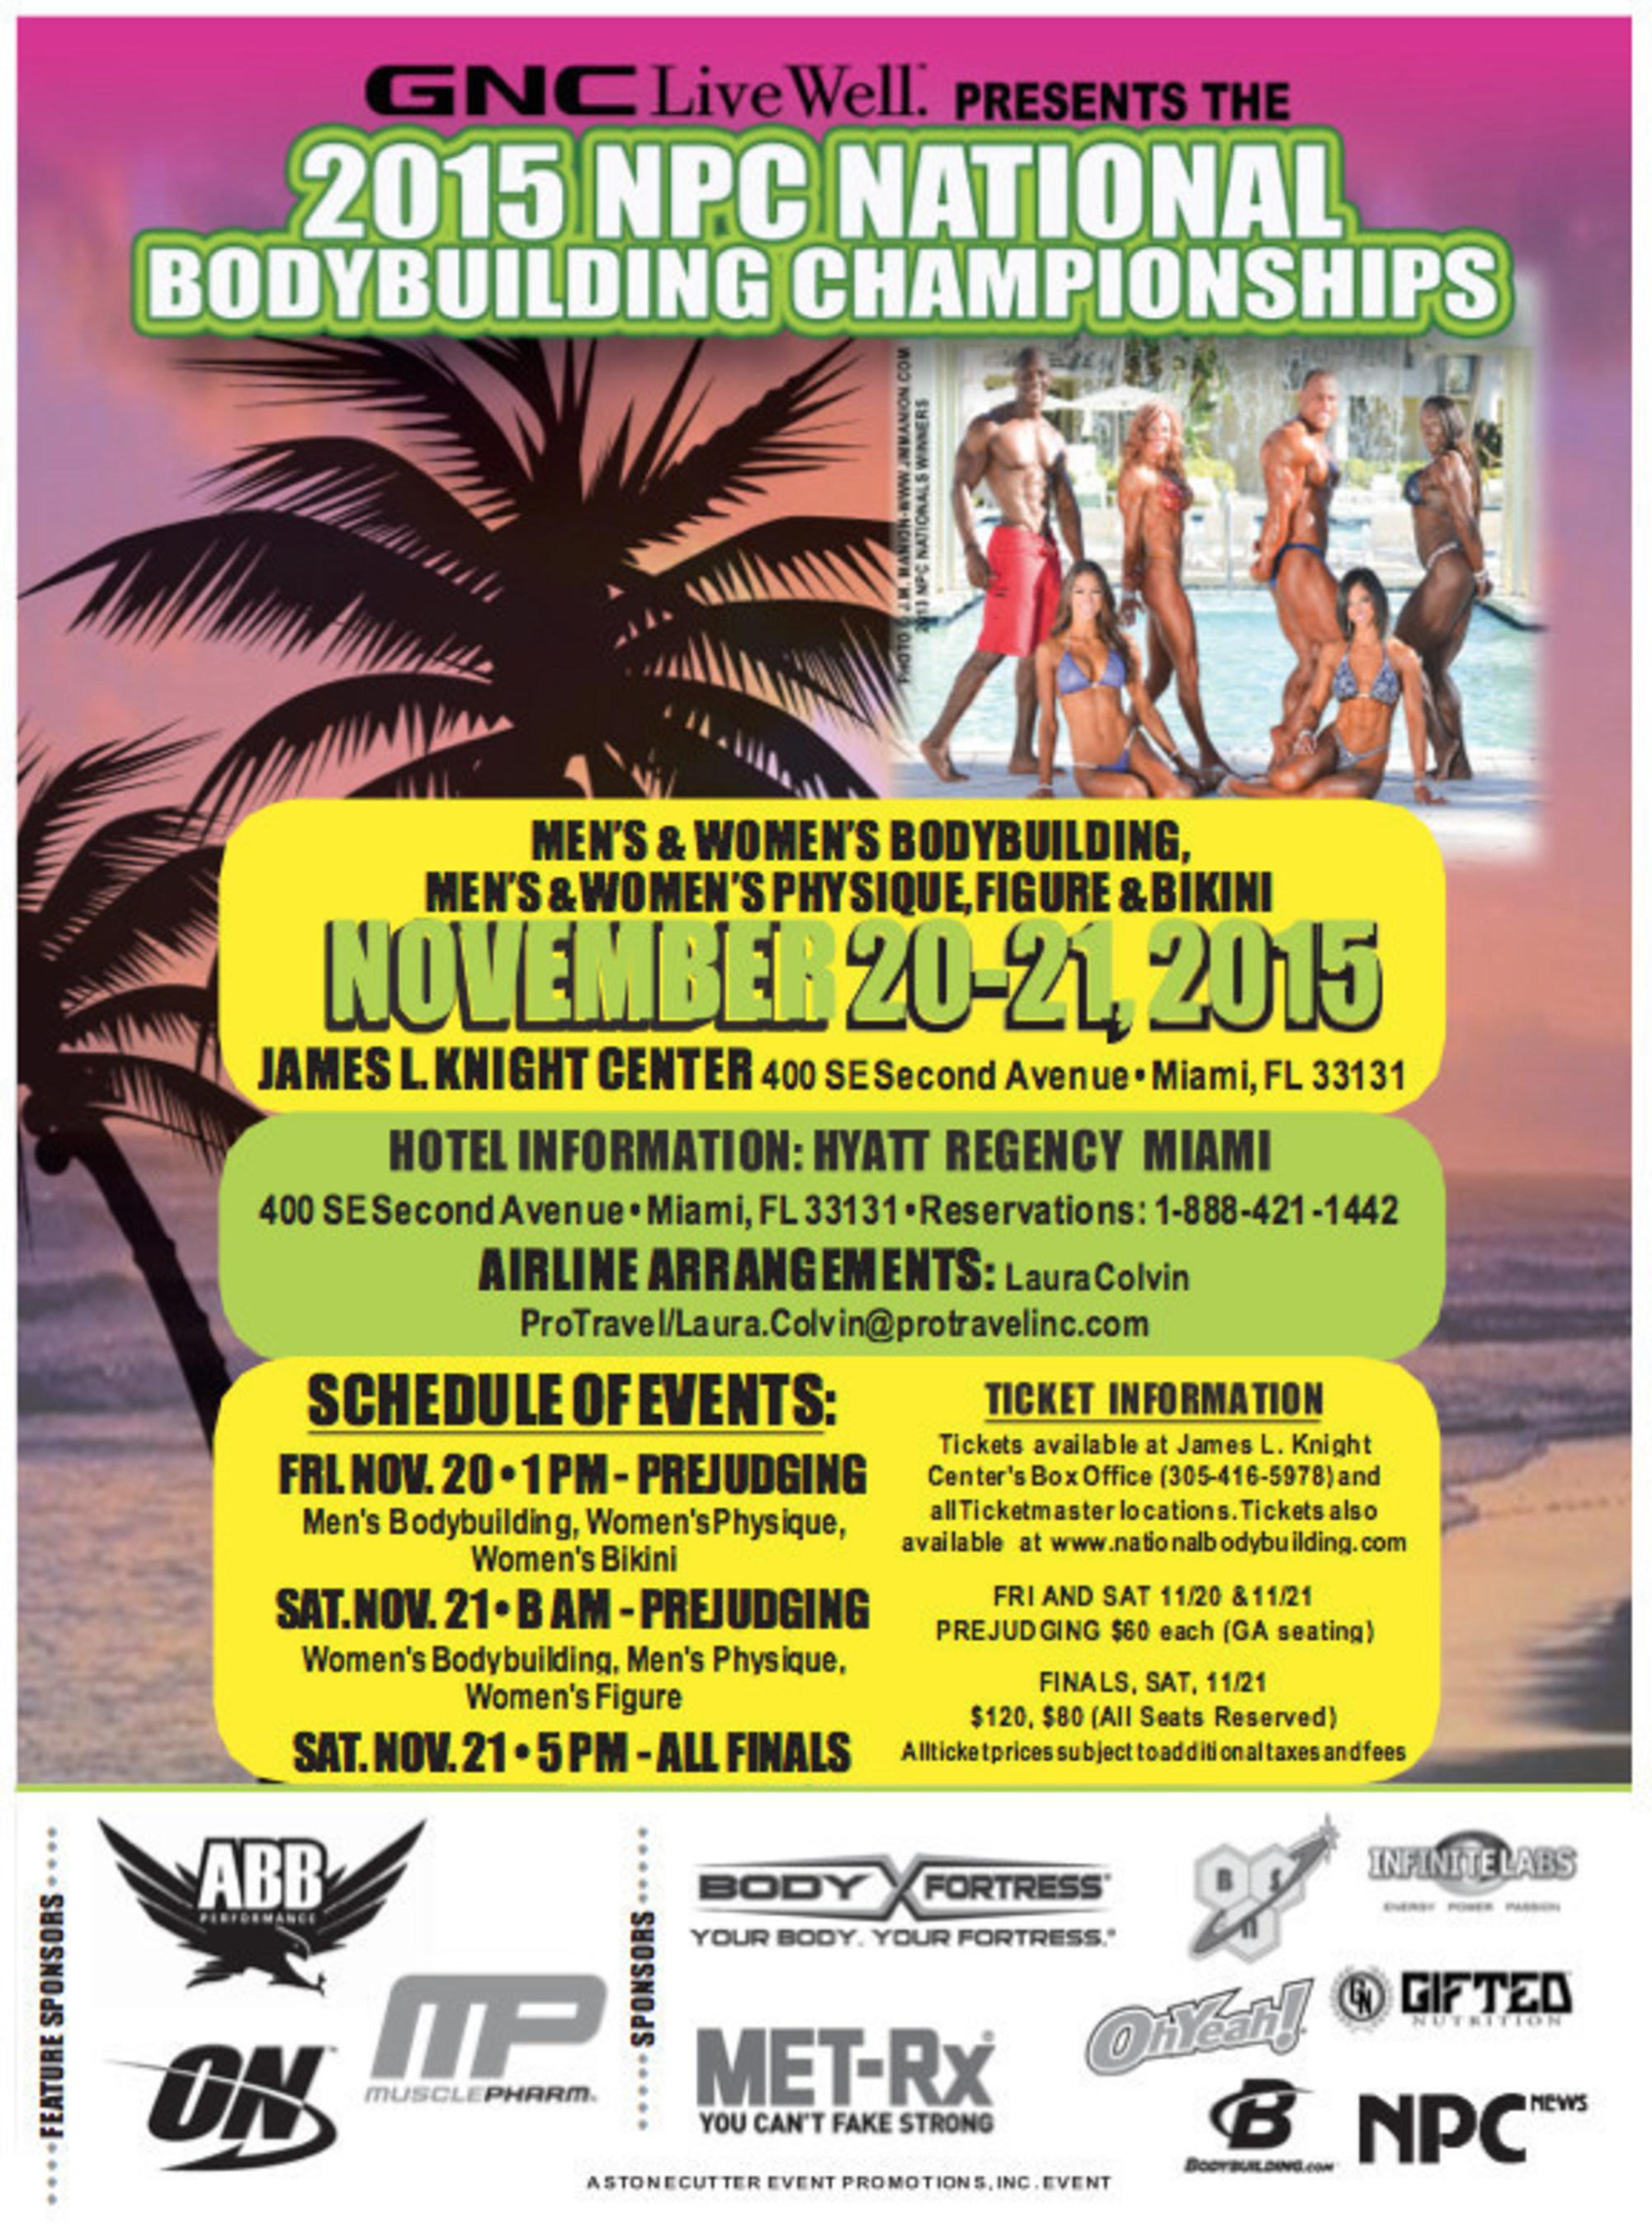 2015 NPC National Bodybuilding Championships Take Over Miami November 20-21